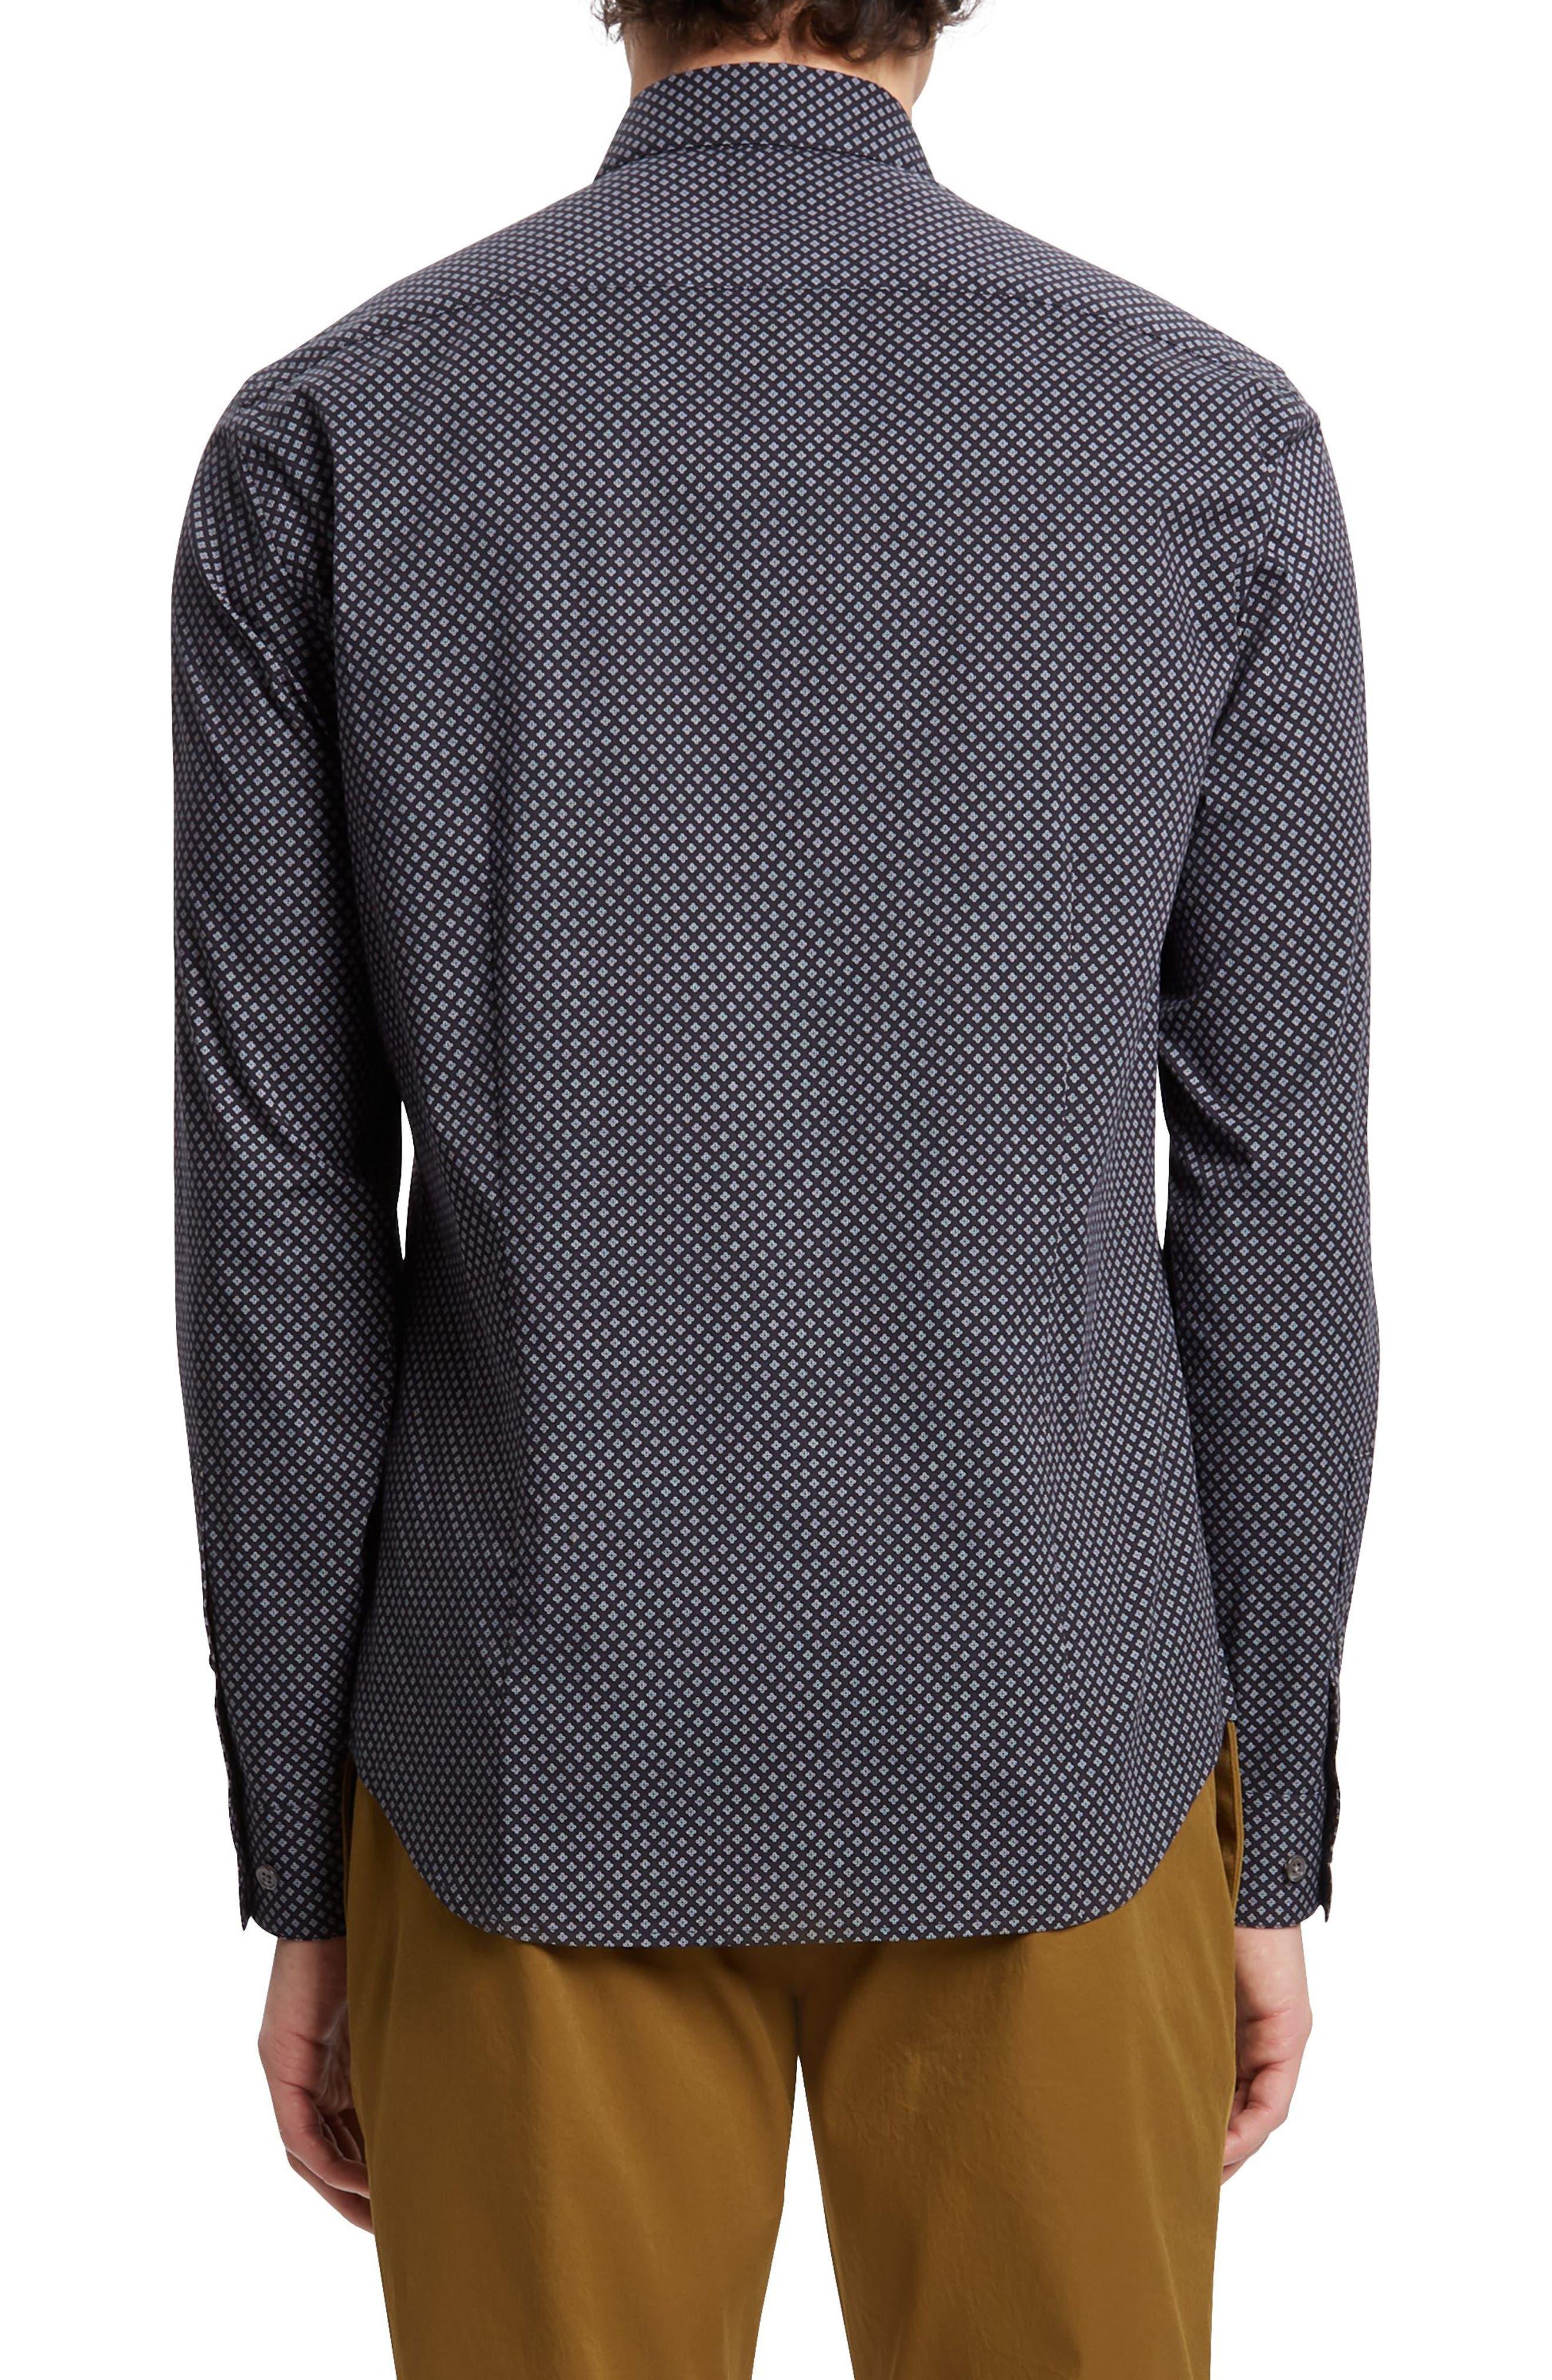 Sylvain Kessler Patterned Sport Shirt,                             Alternate thumbnail 2, color,                             BLACK MULTI